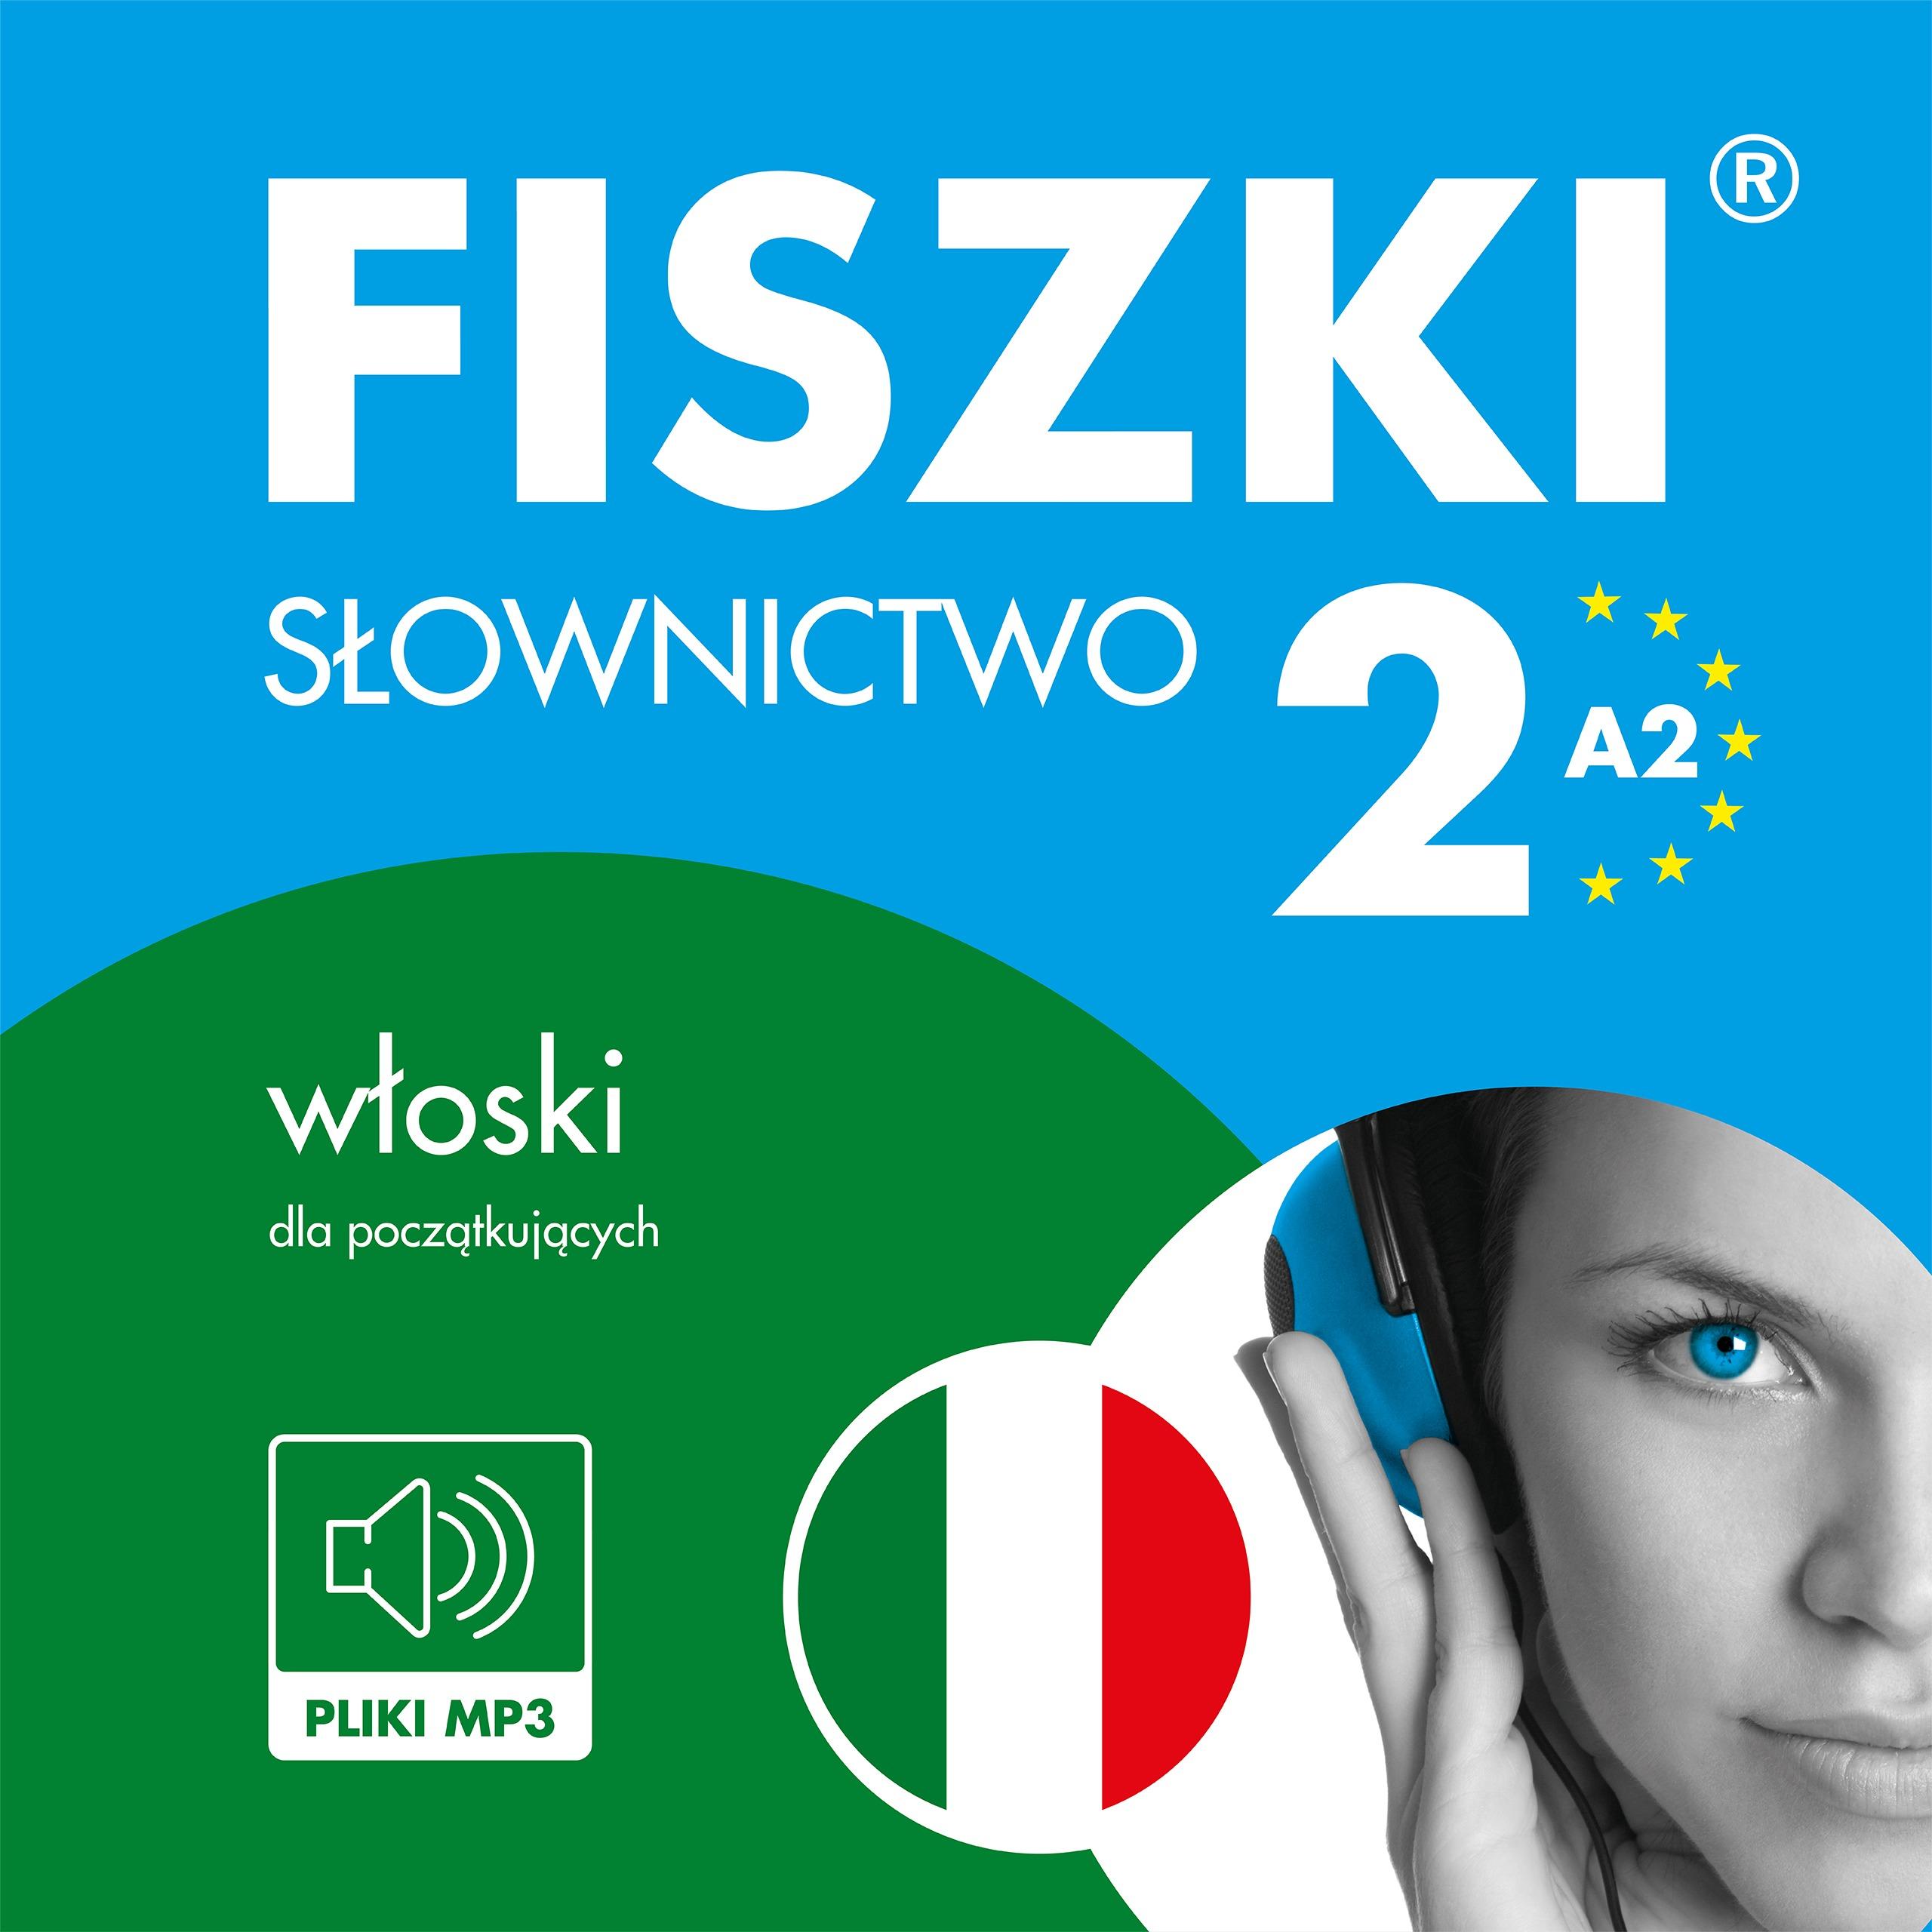 AUDIOBOOK - włoski - Słownictwo 2 (A2)